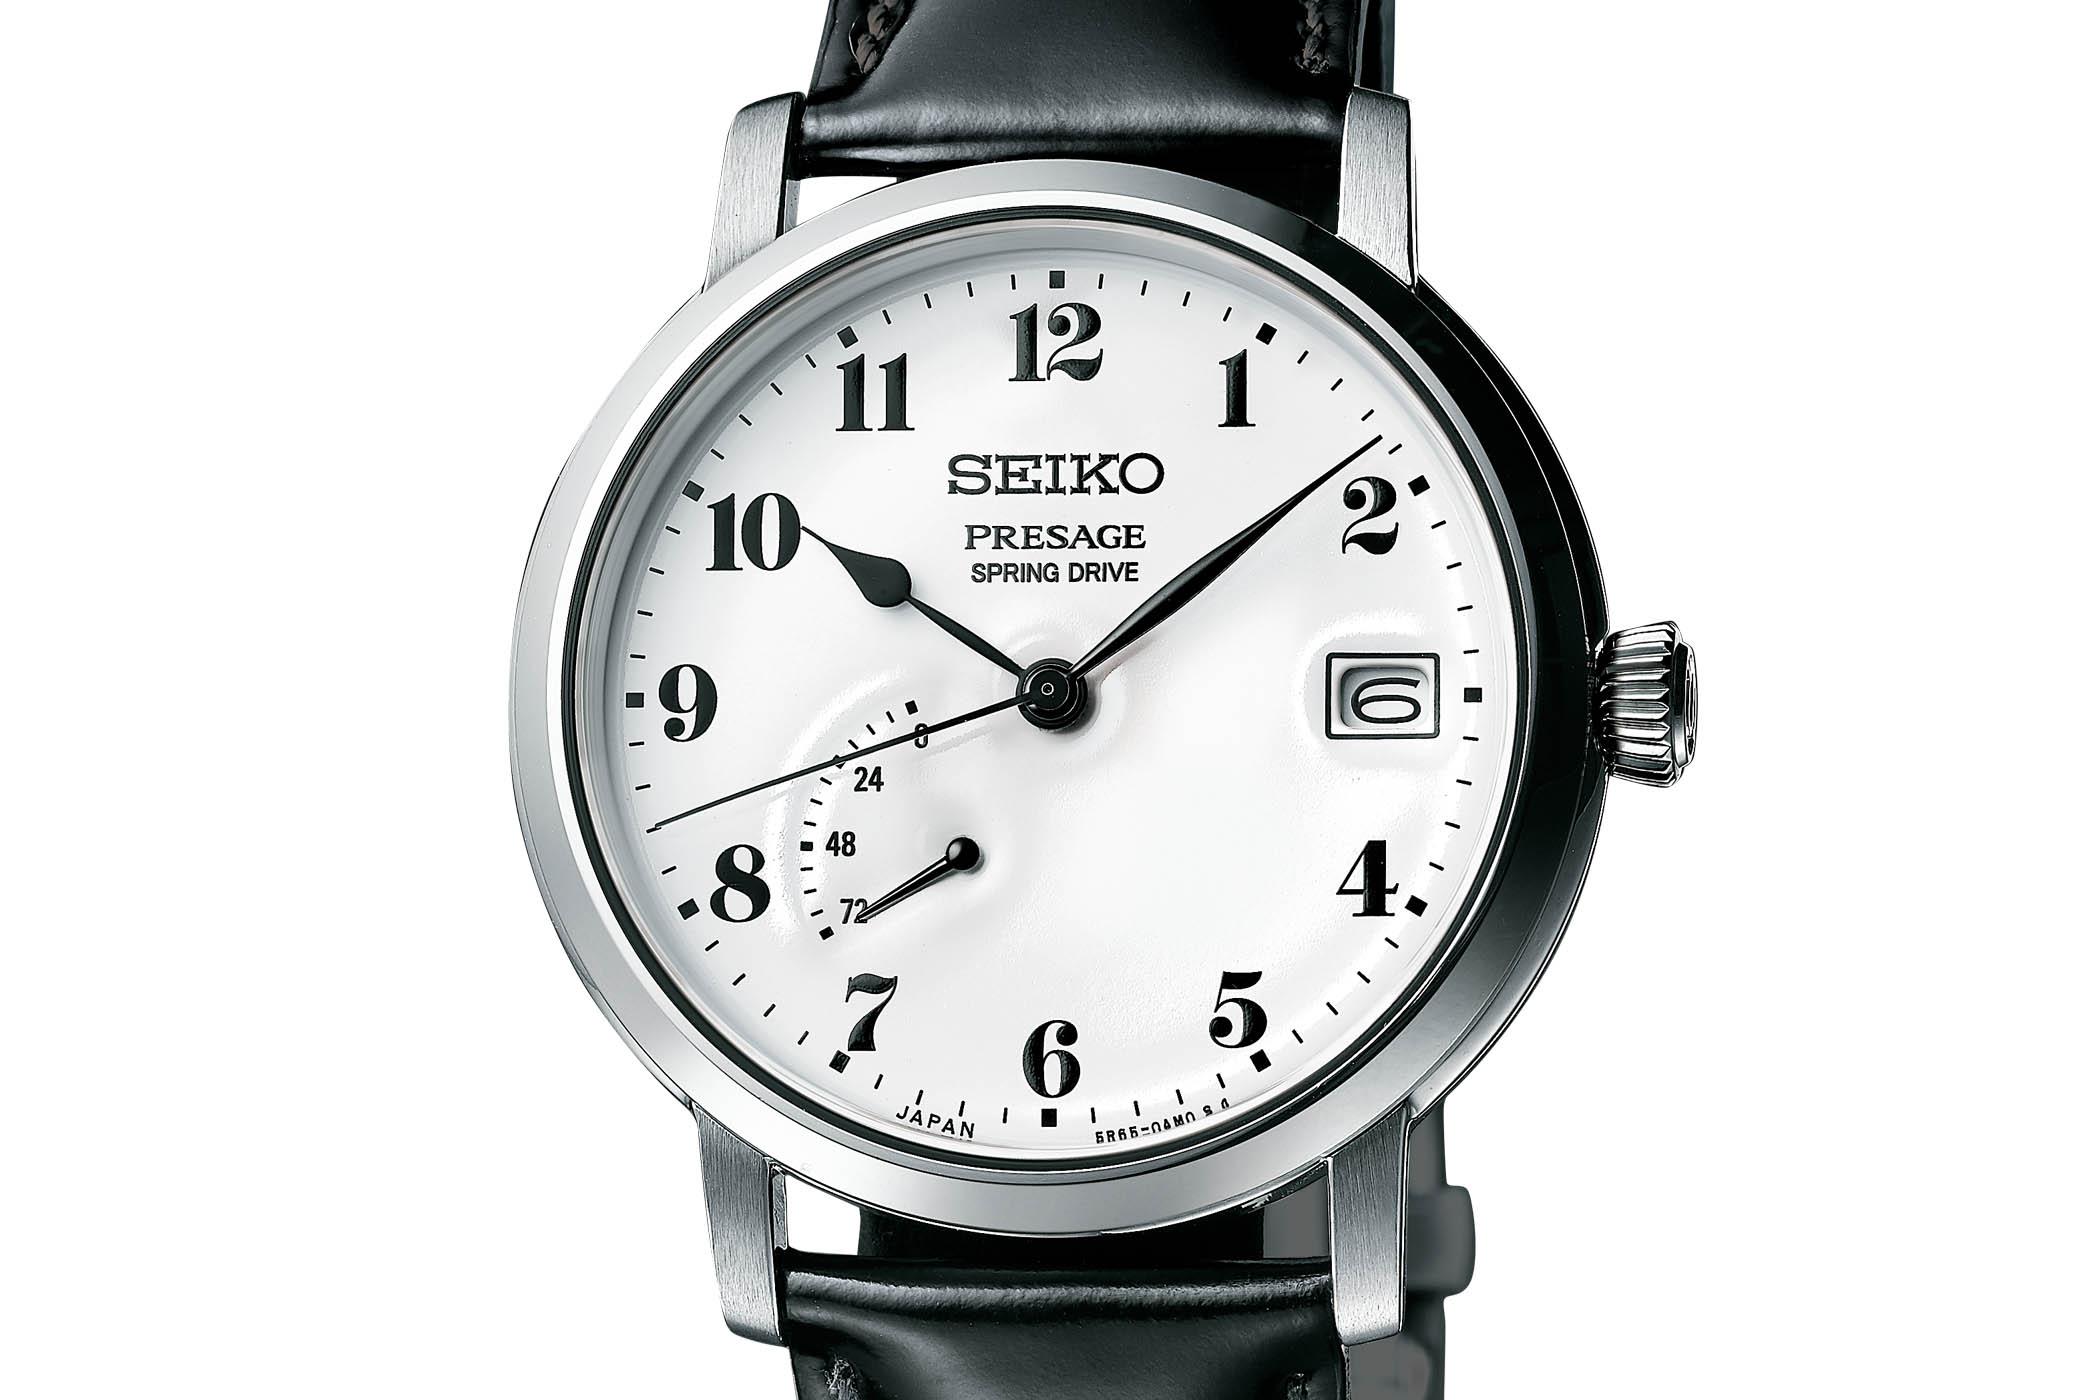 Seiko-Presage-Prestige-Line-Enamel-Dial-Spring-Drive-SARR001-SARR03-1